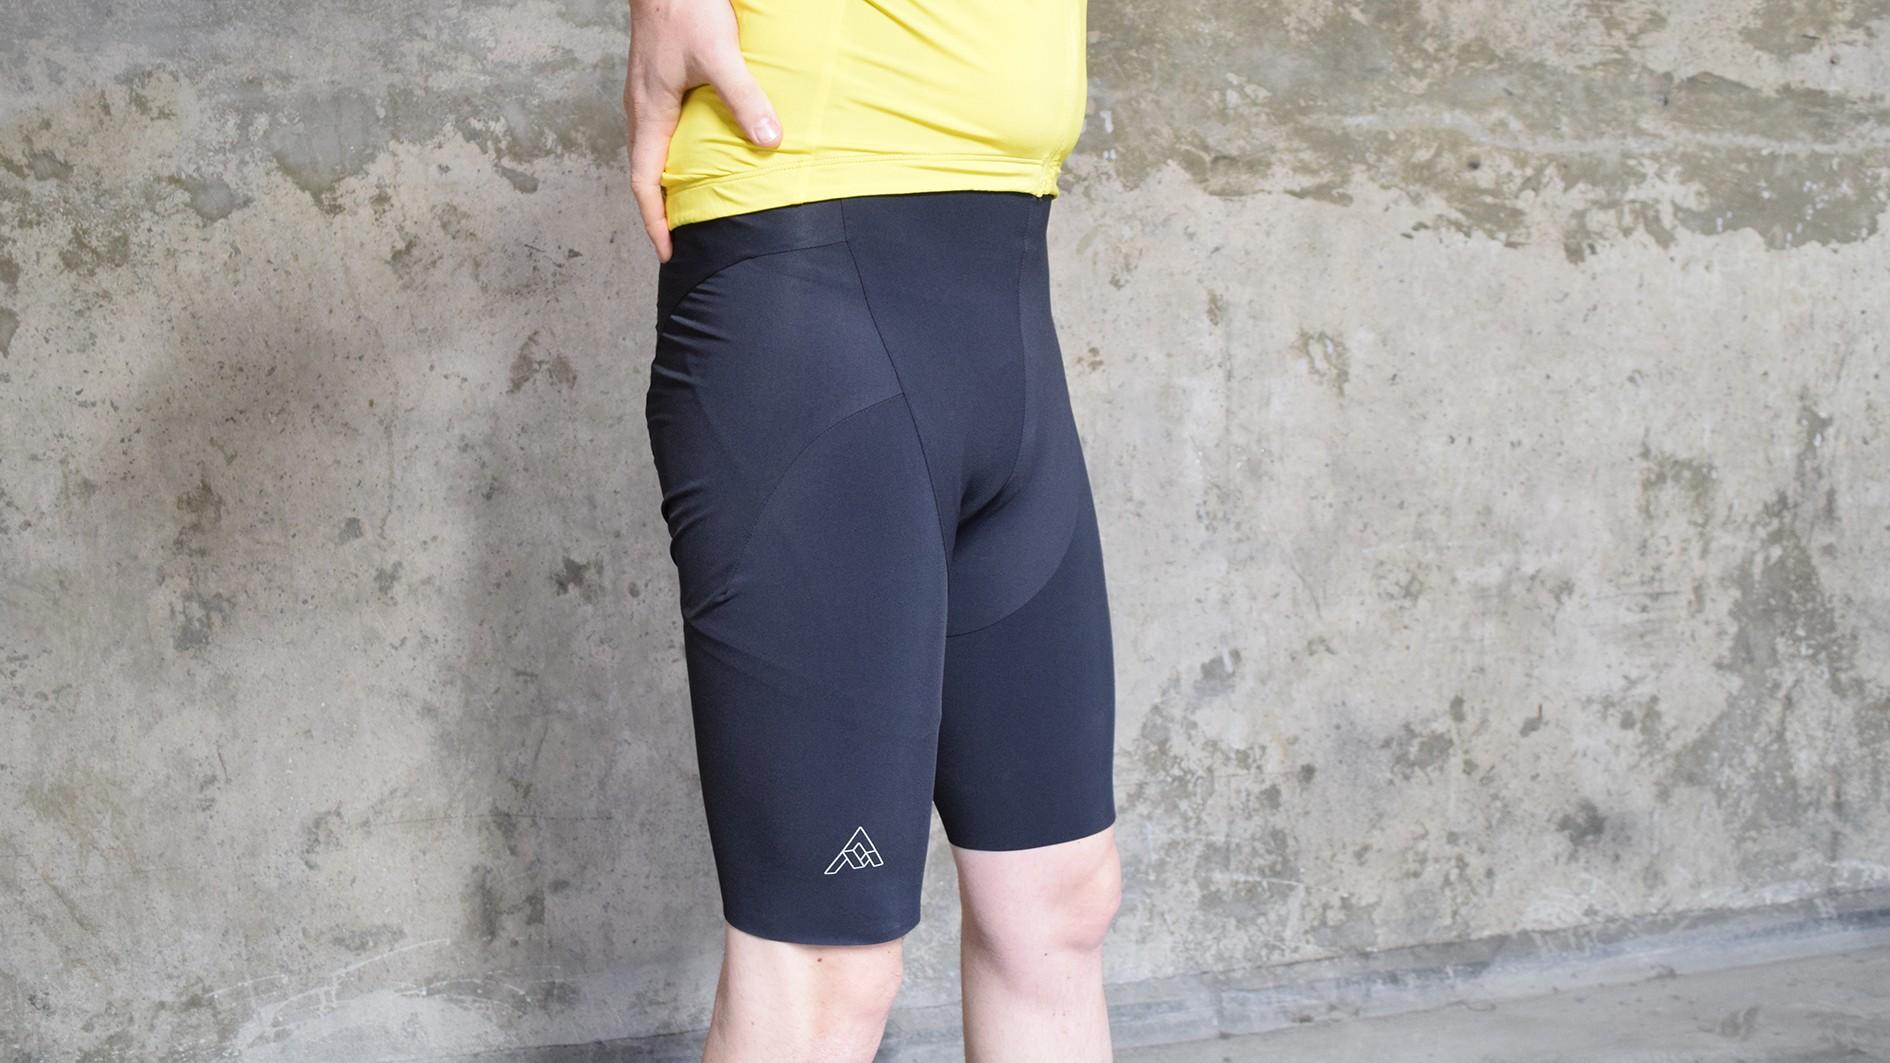 7Mesh MK3 bib shorts